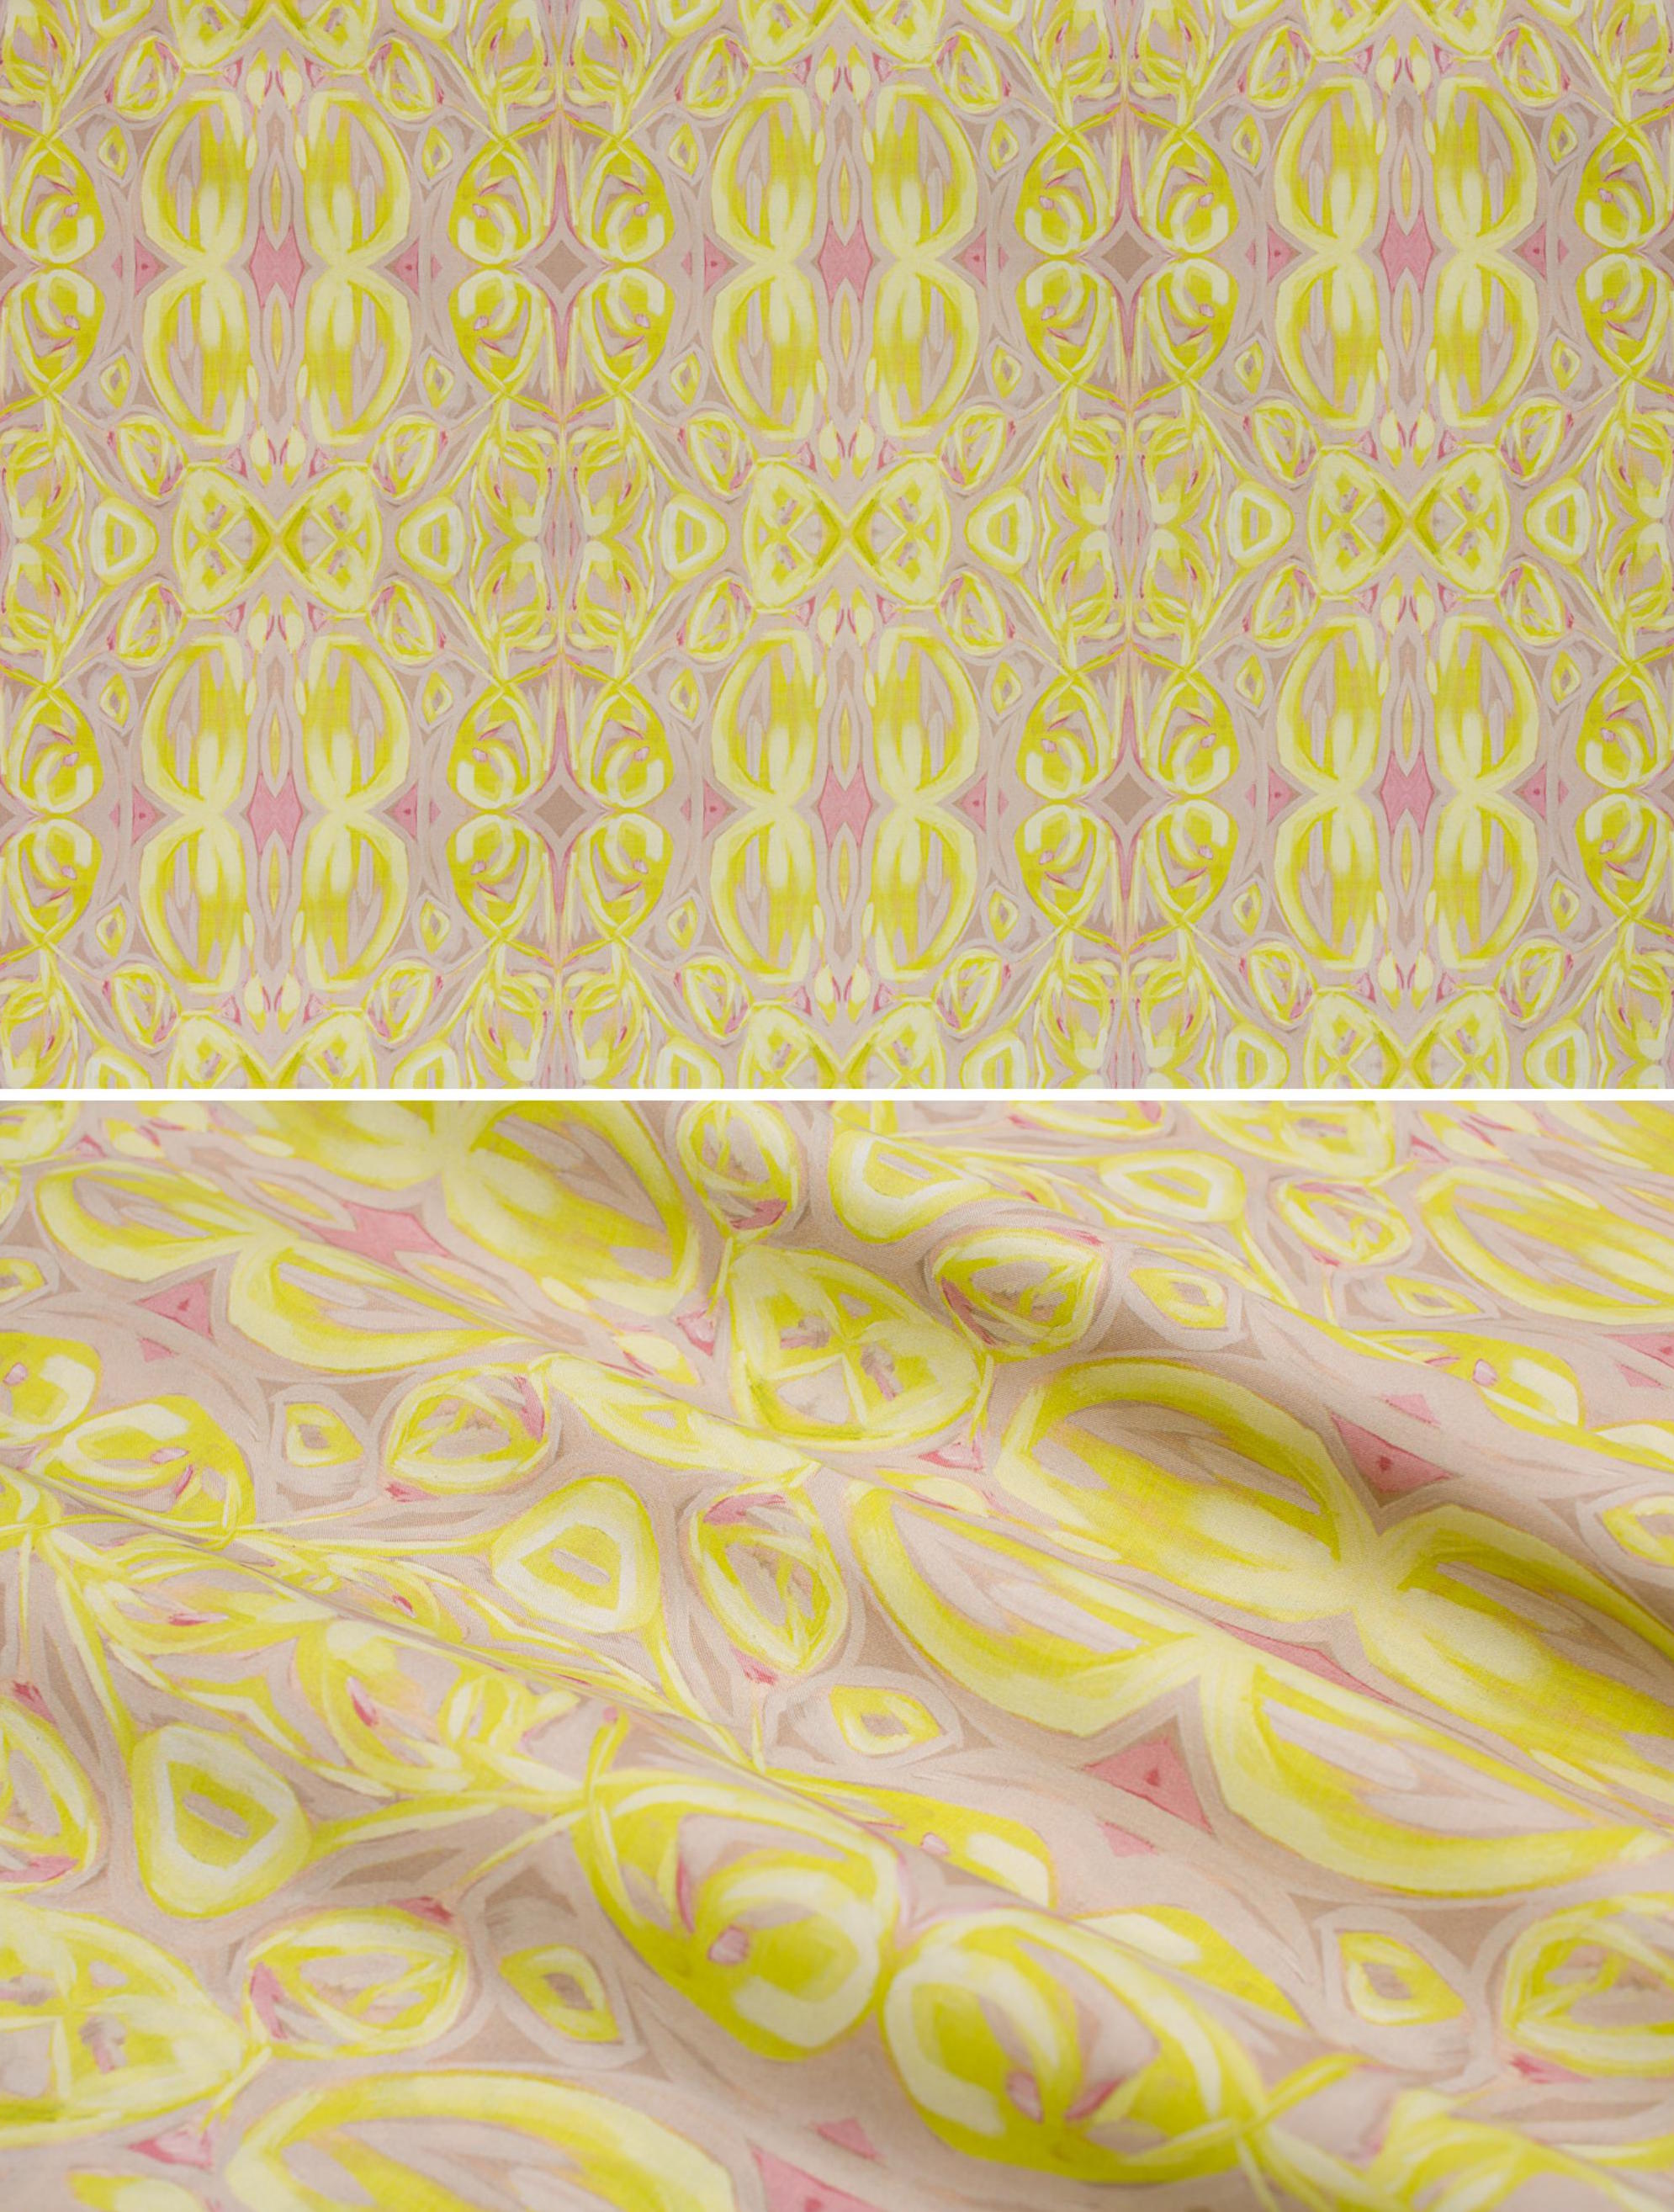 "Moonbeam   Linen Cotton Canvas 36"" x 54"" Repeat is 9.00"" x 8.78"""